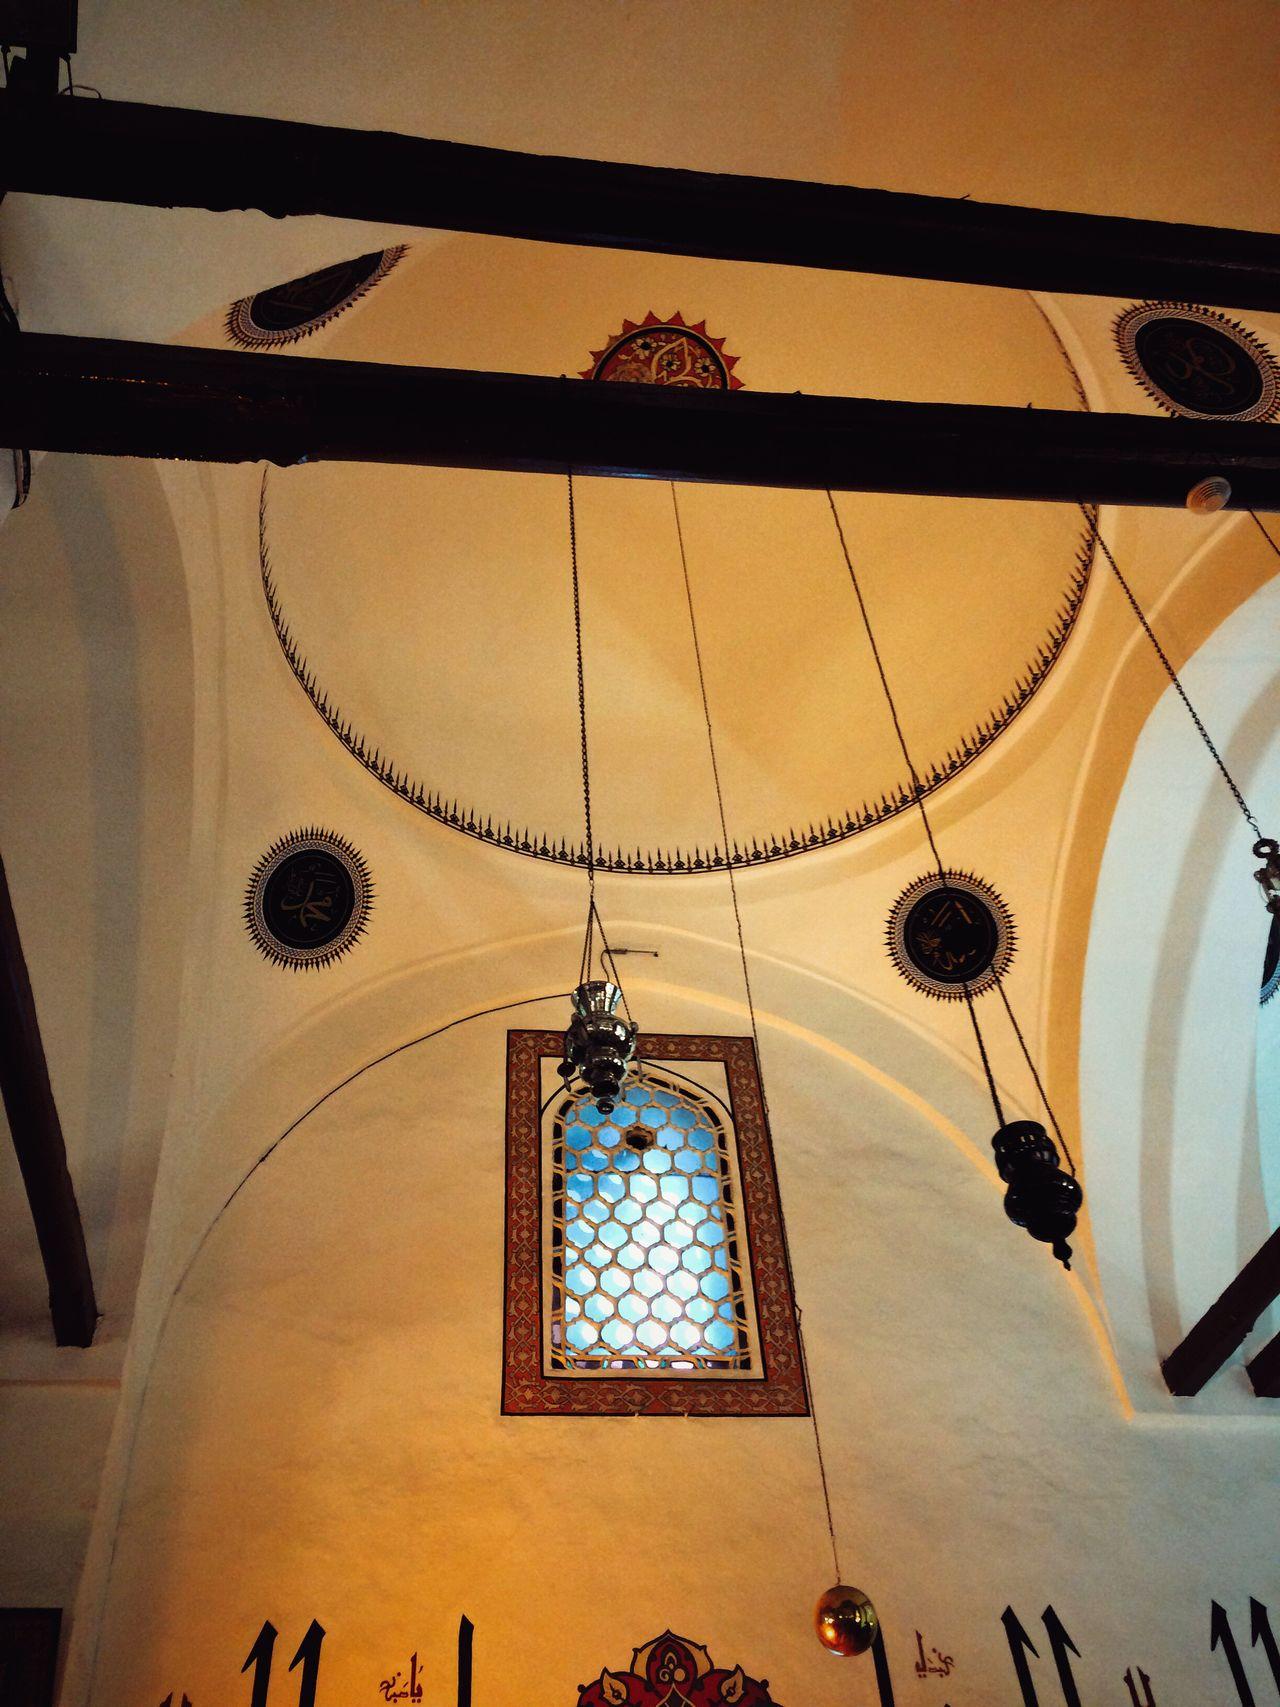 Vintage Elégance Love ♥ Mevlana Türbesi Mevlana Mosque Konya Turkey Konya Turkey Arts Culture And Entertainment Retro